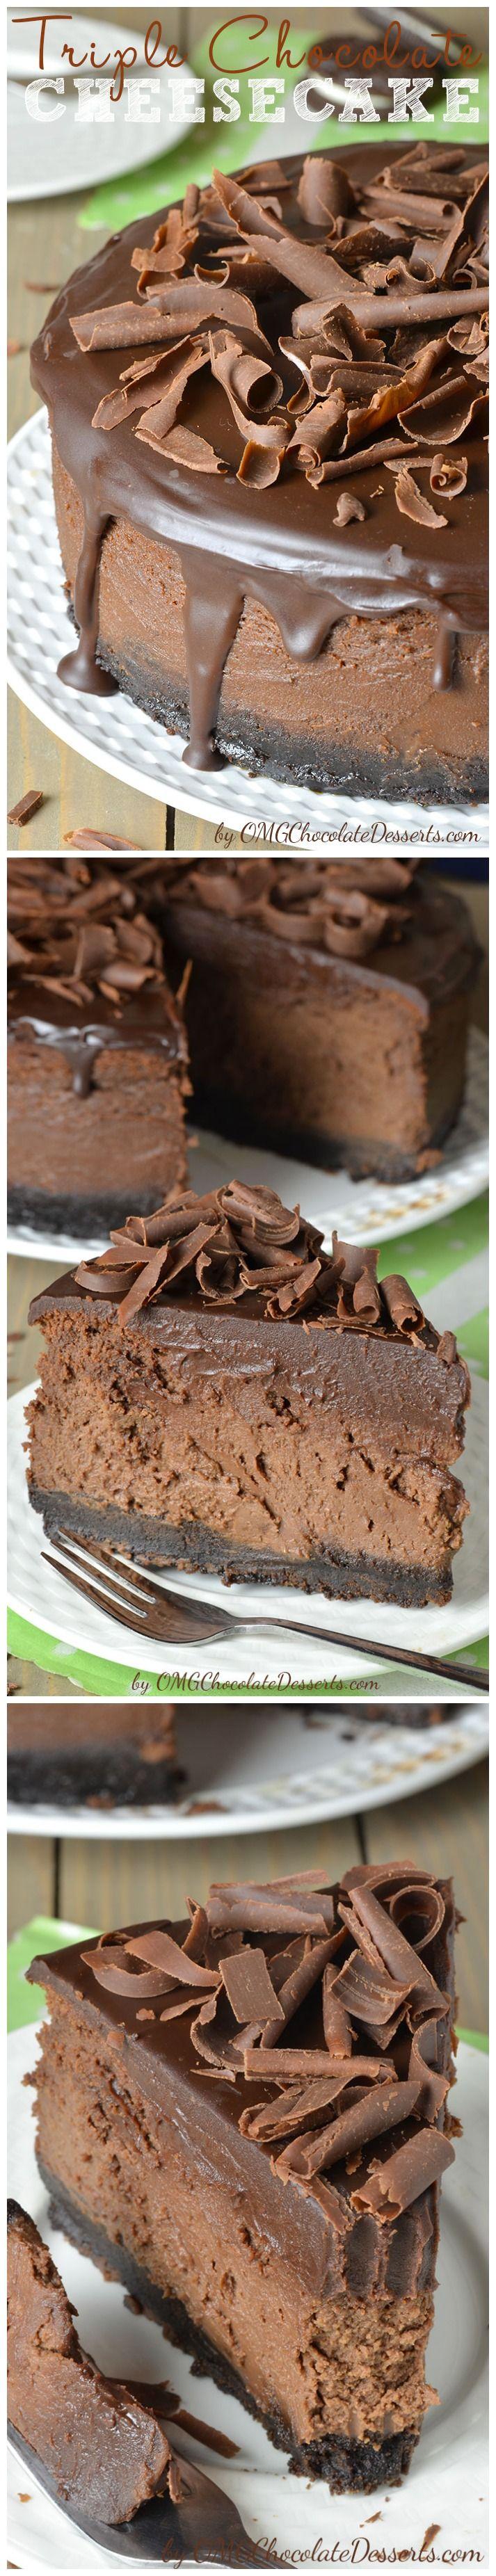 Triple Chocolate Cheesecake | Recipe Source